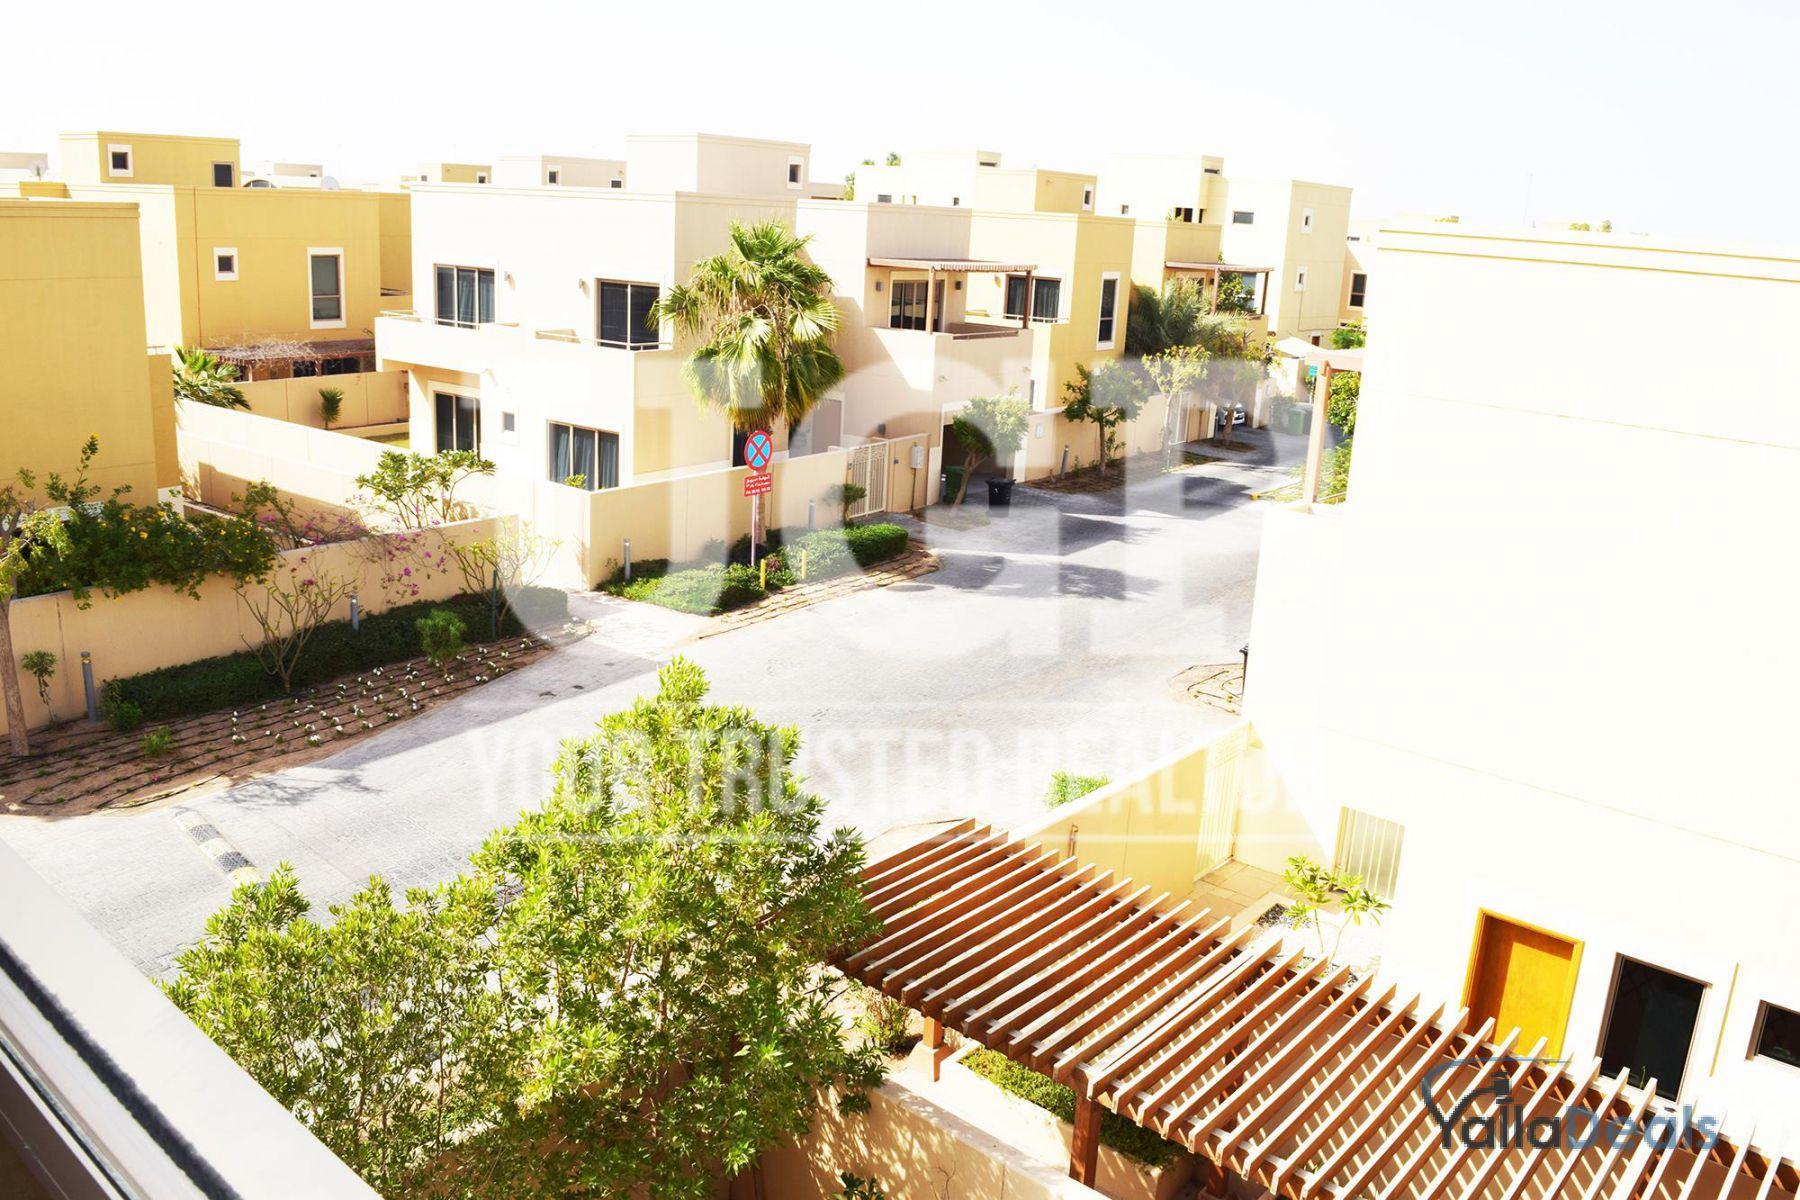 Townhouses for Sale in Al Raha Gardens, Abu Dhabi